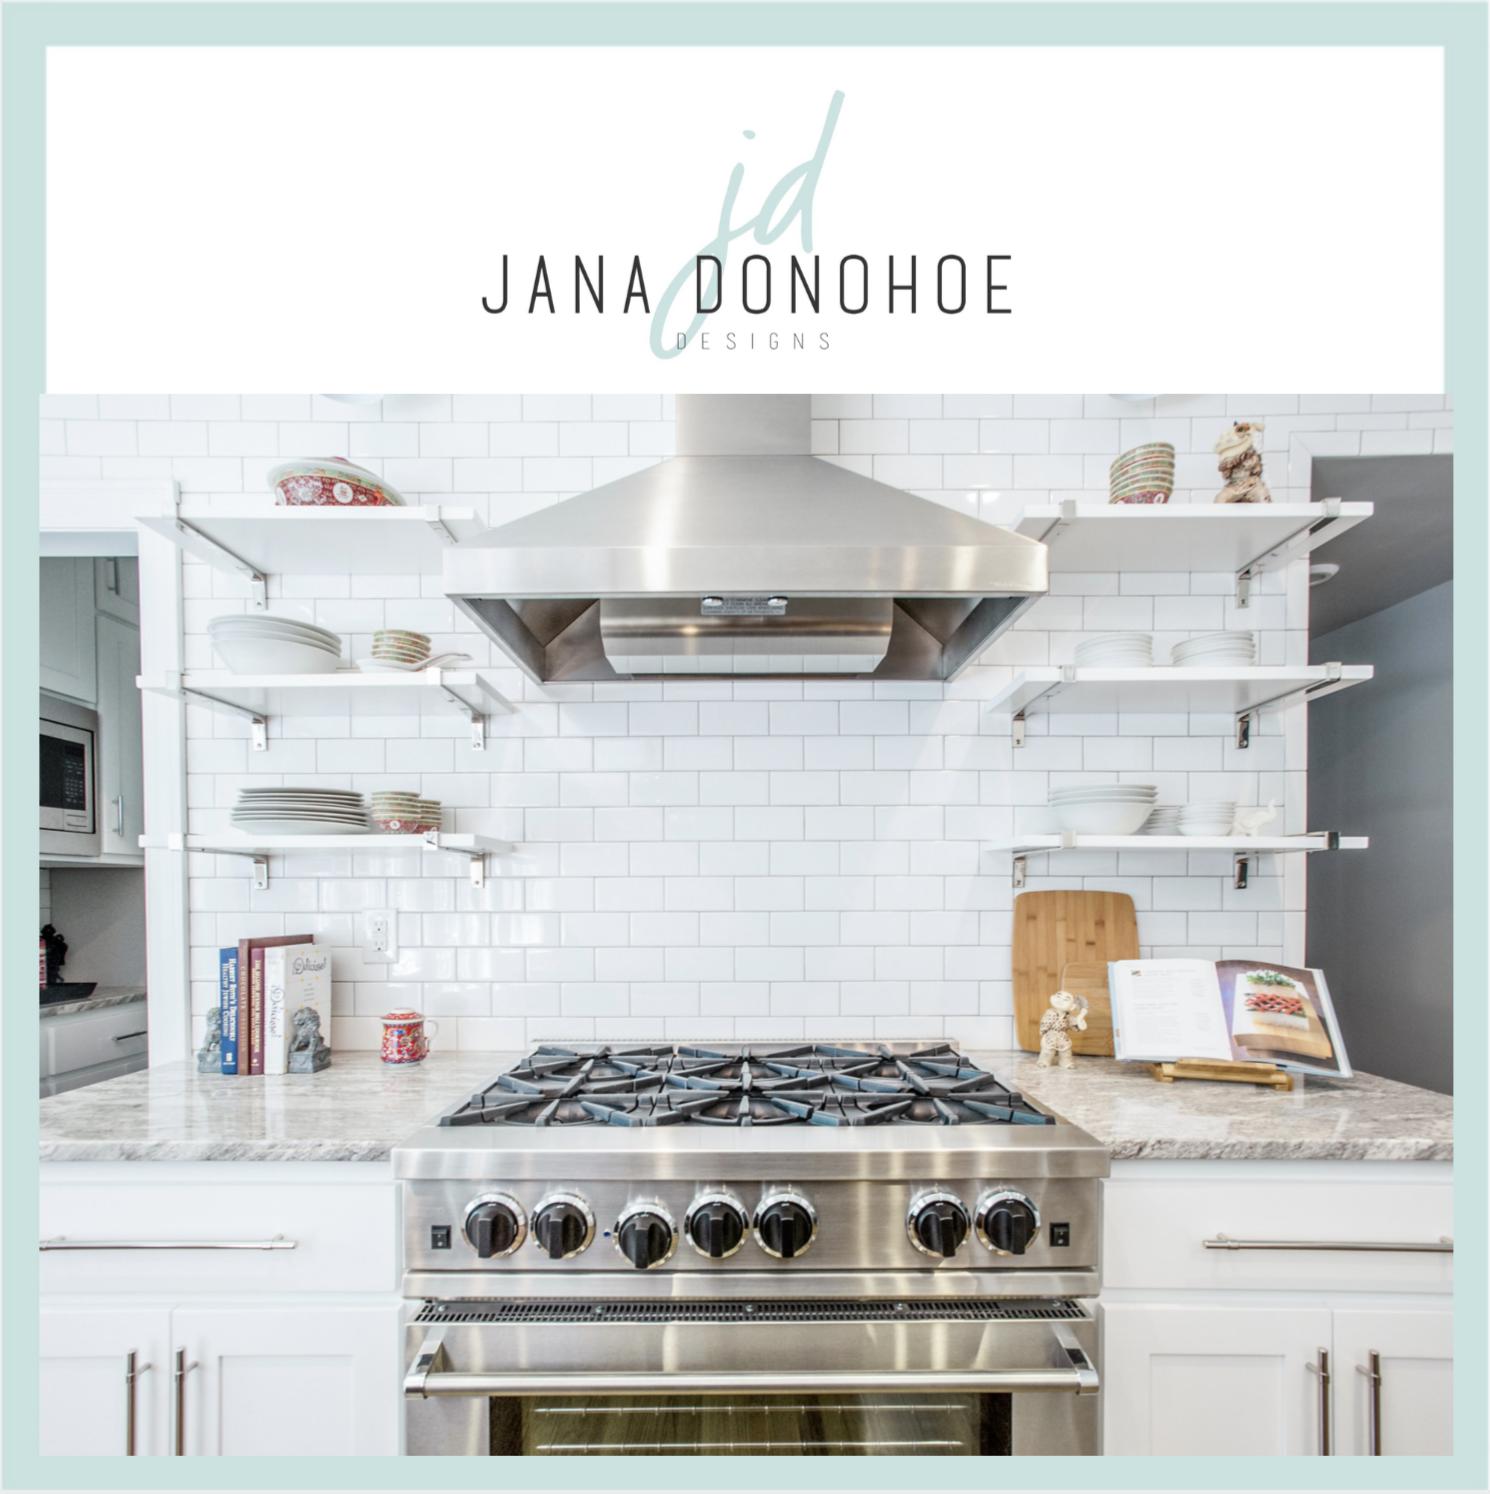 Open Shelving Kitchens: Organizing Top Tips! — Jana Donohoe ...